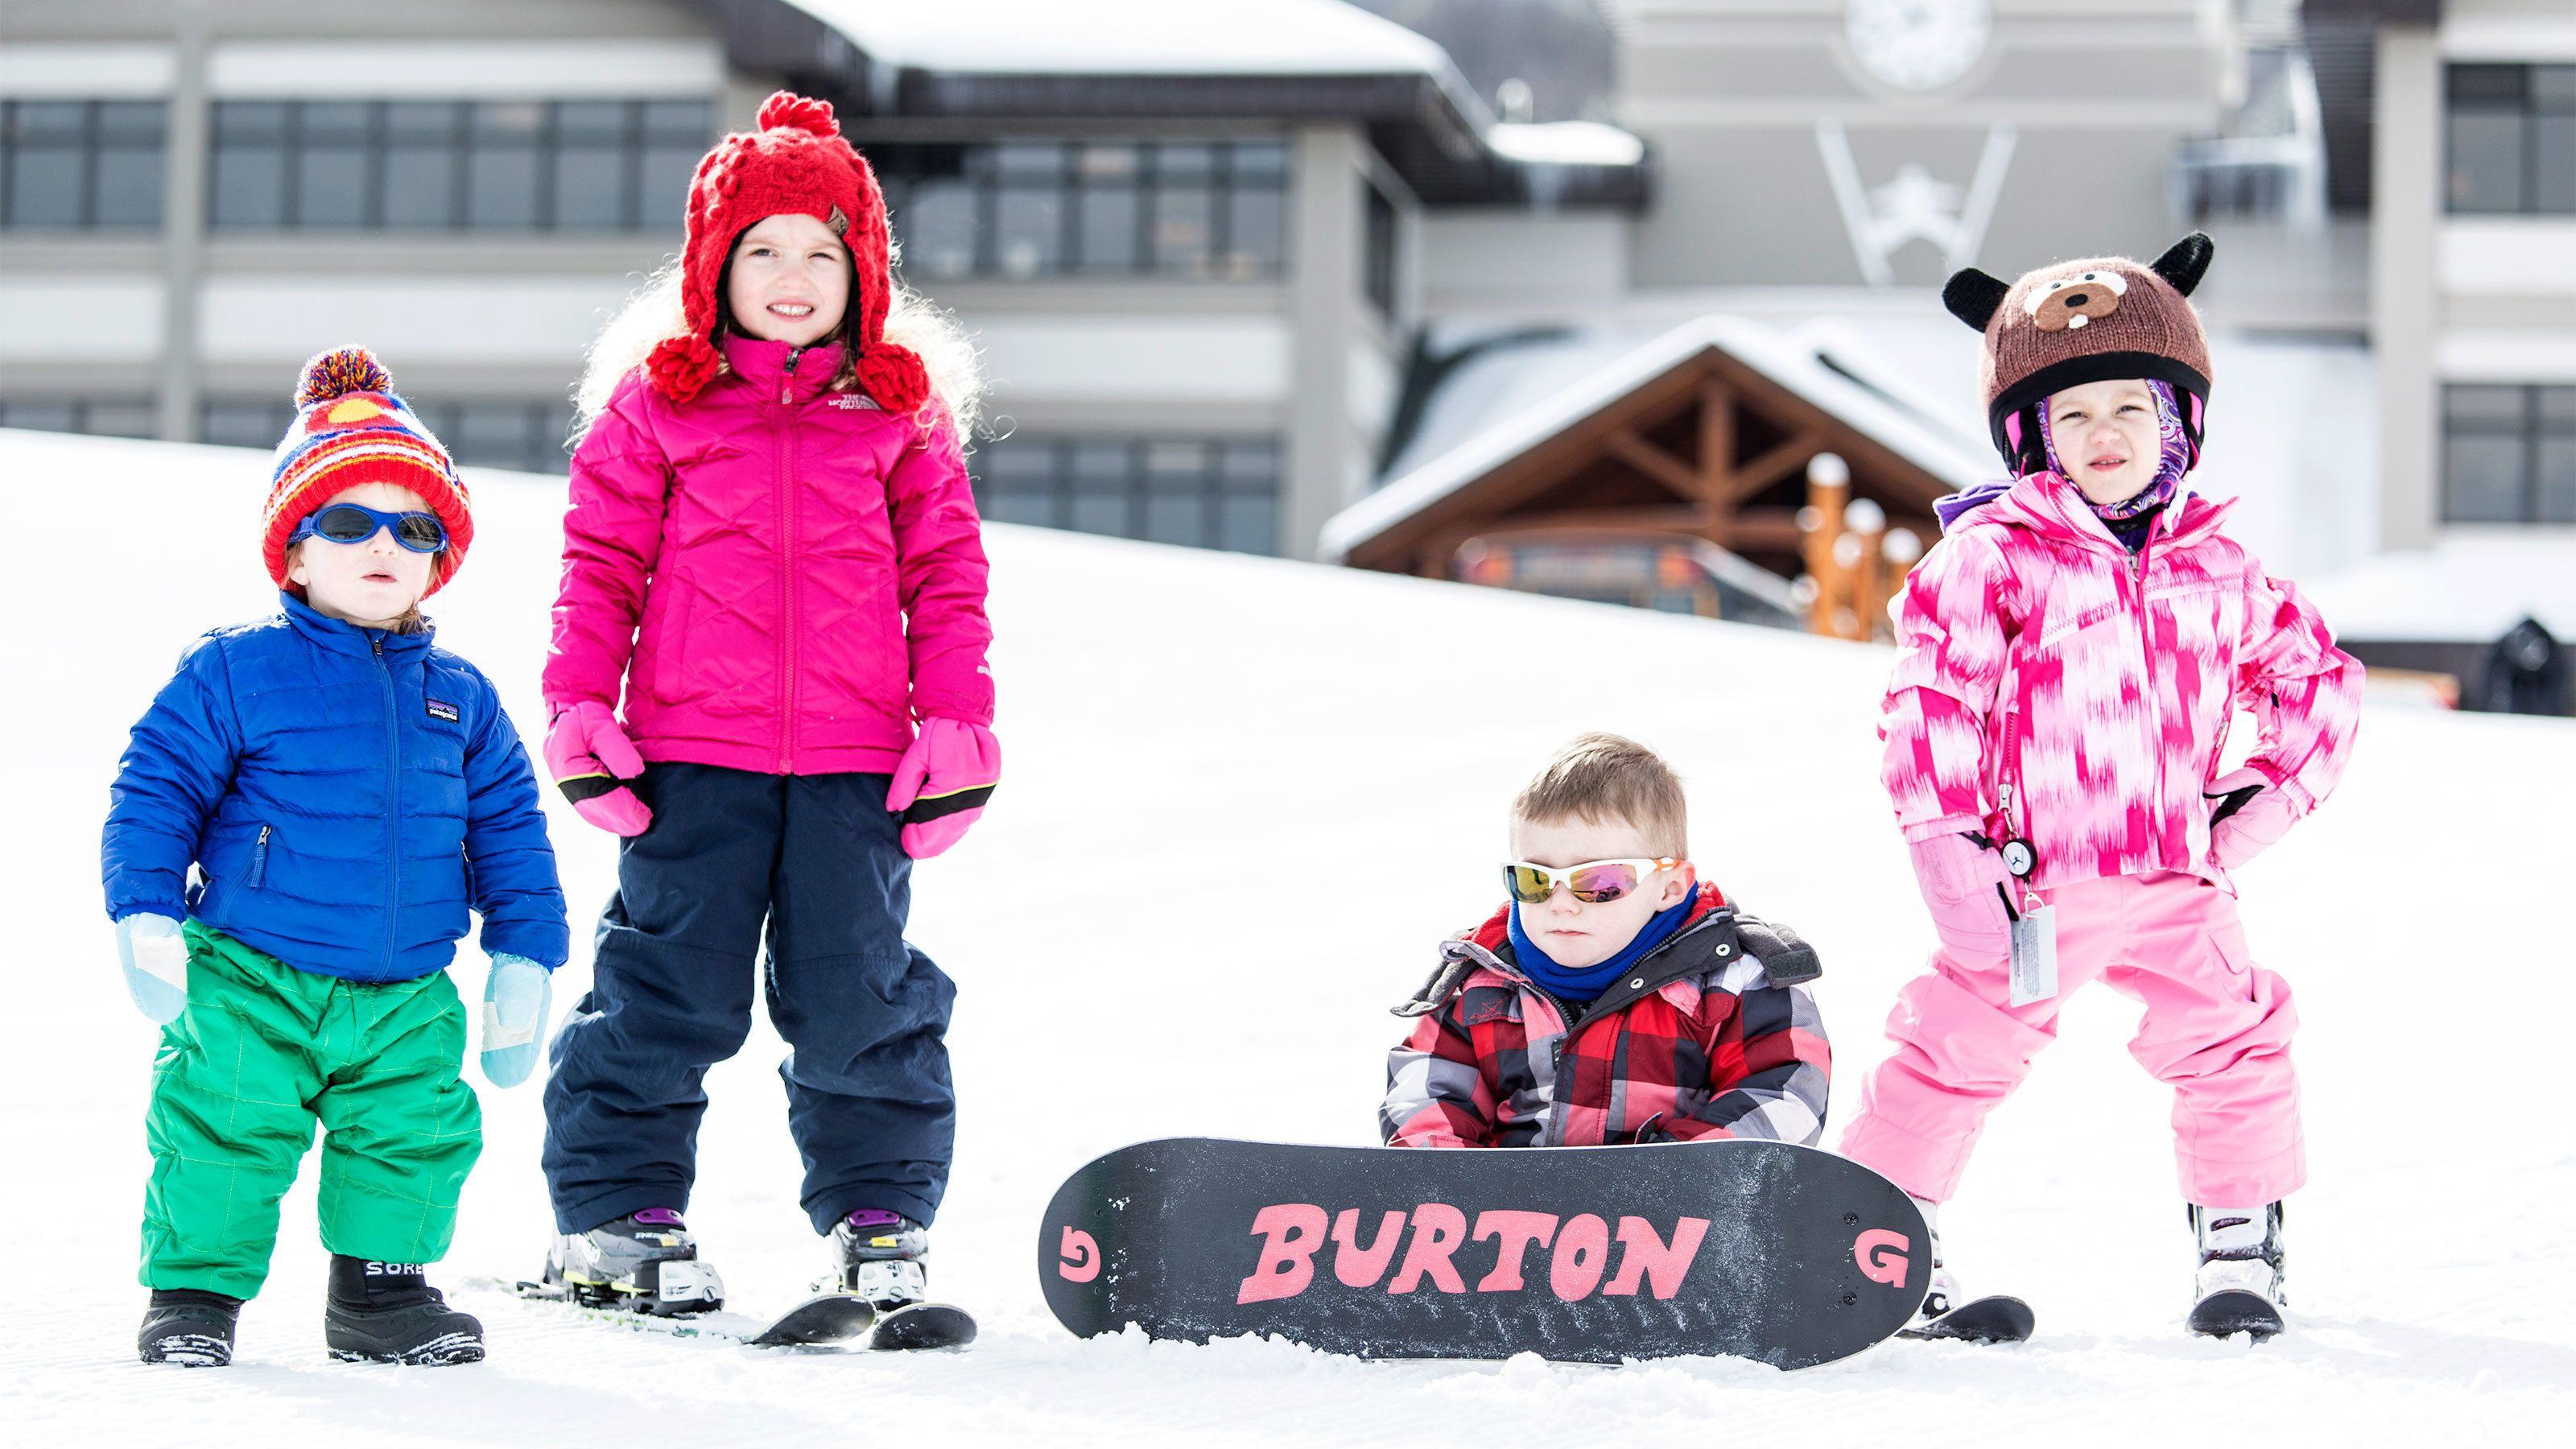 Kids on the Hunter Mountain Ski Resort Day Trip